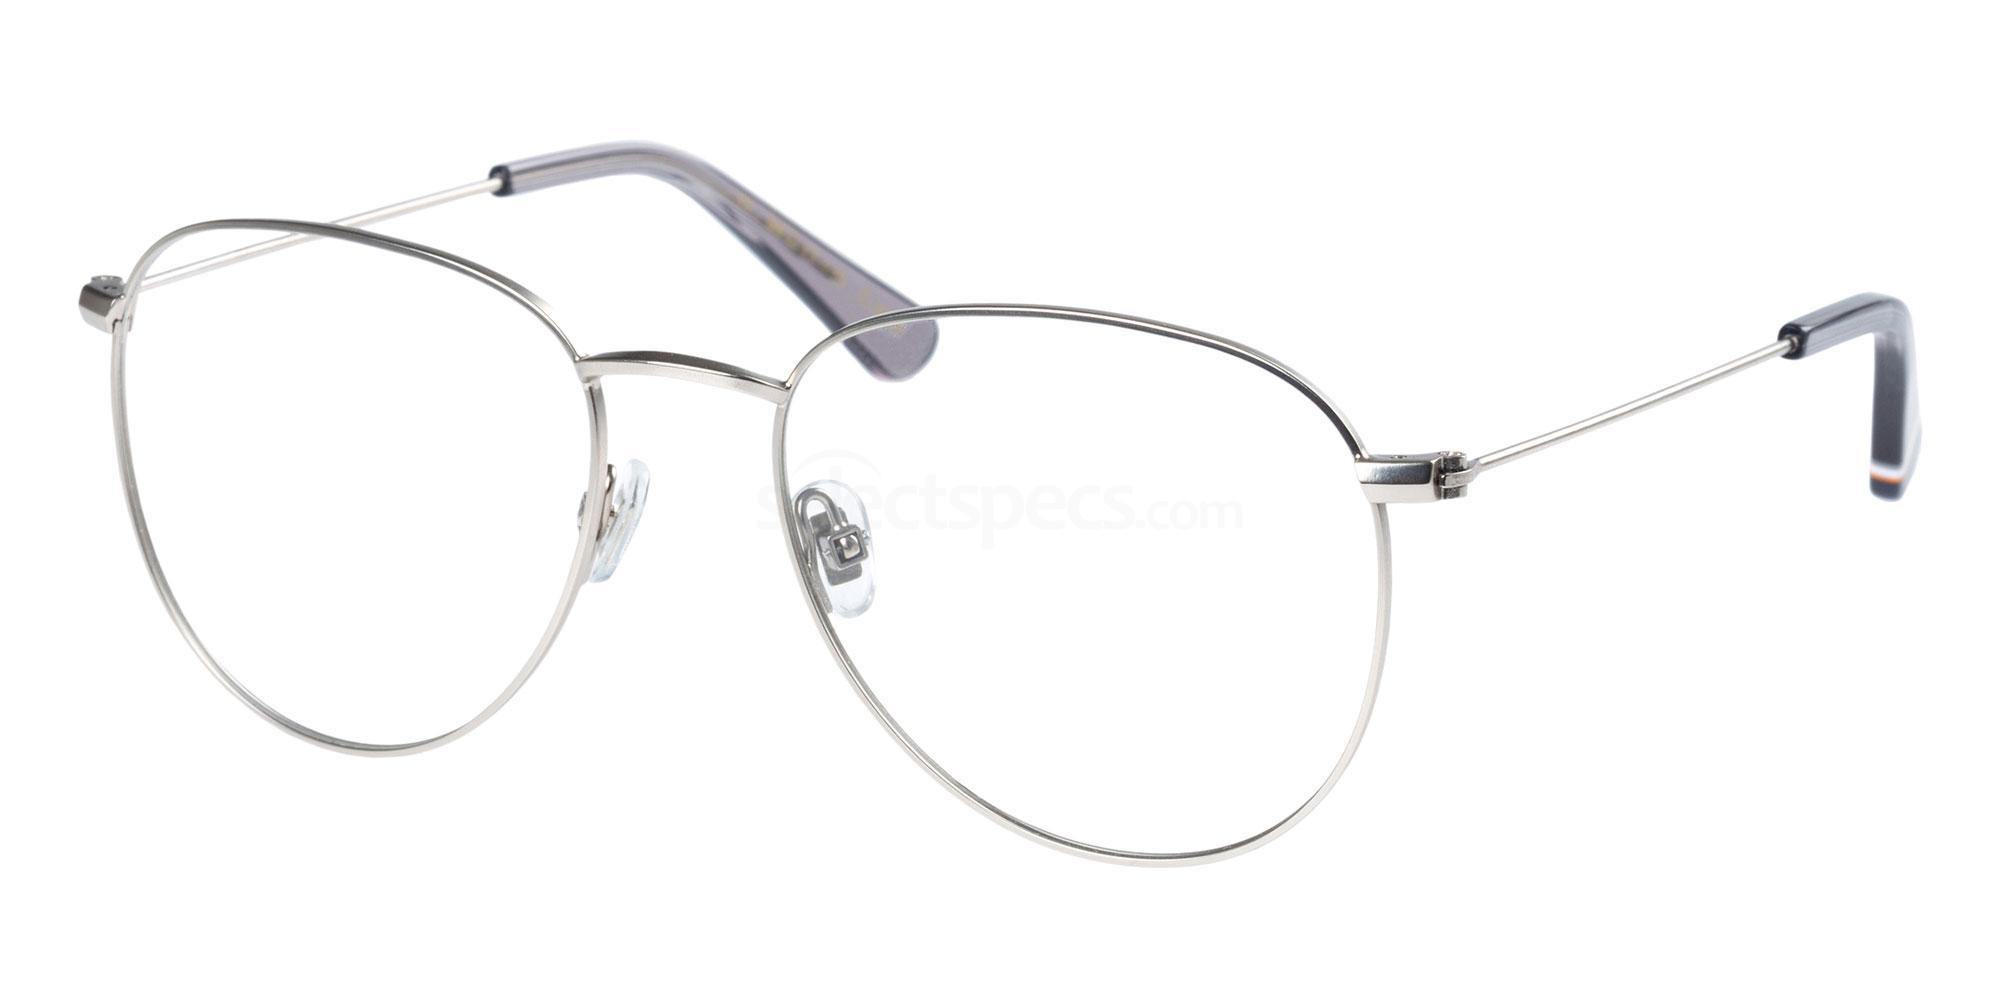 002 SDO-MACKENSIE Glasses, Superdry